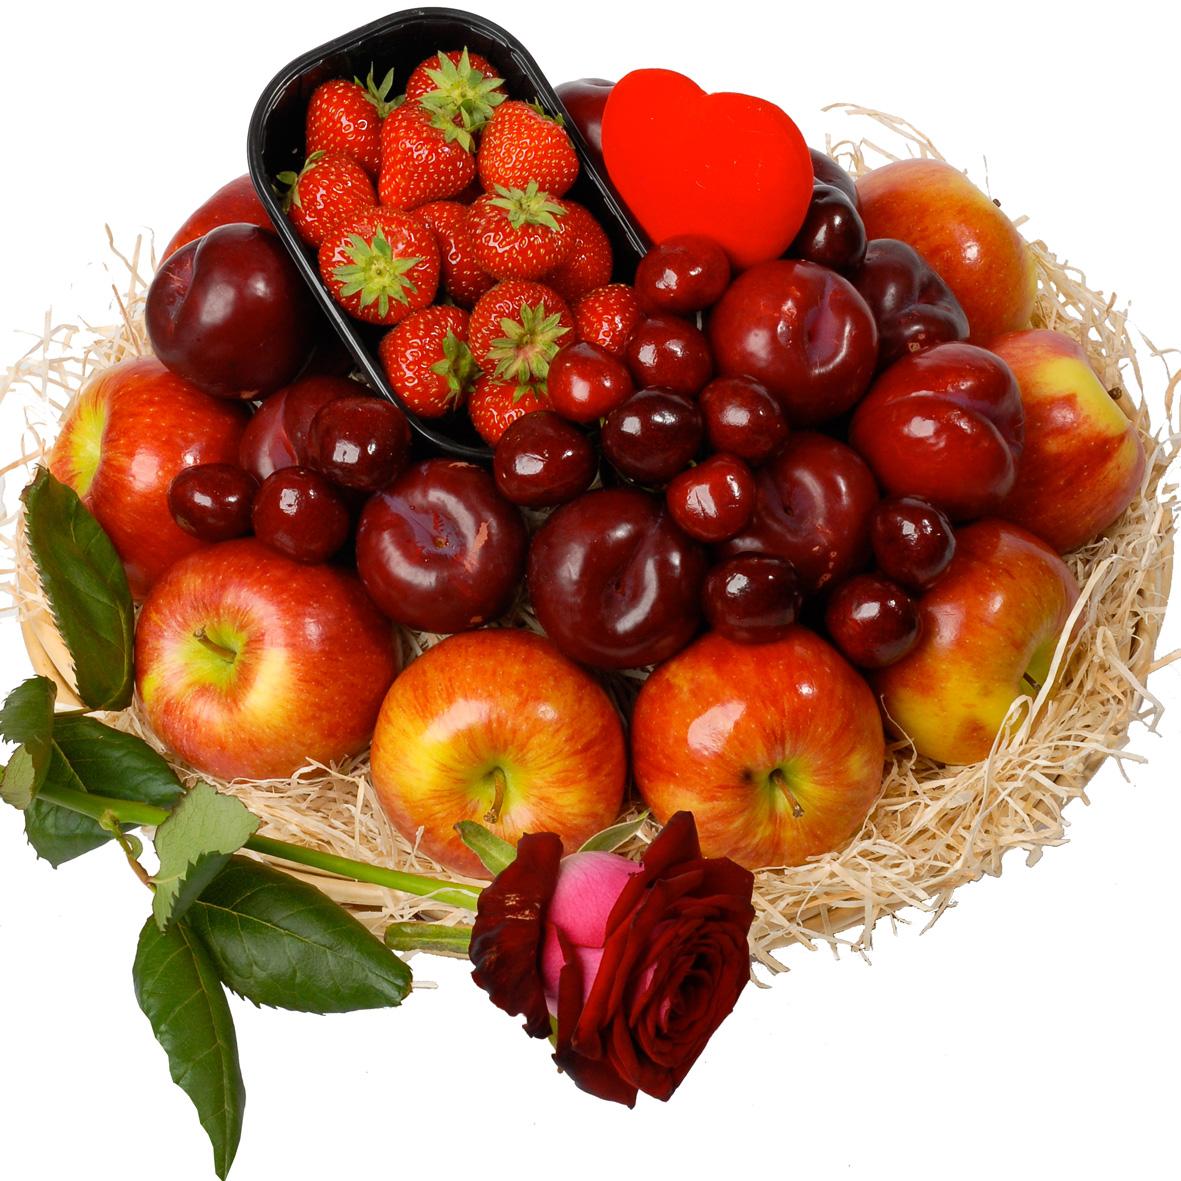 Fruitmand Liefde